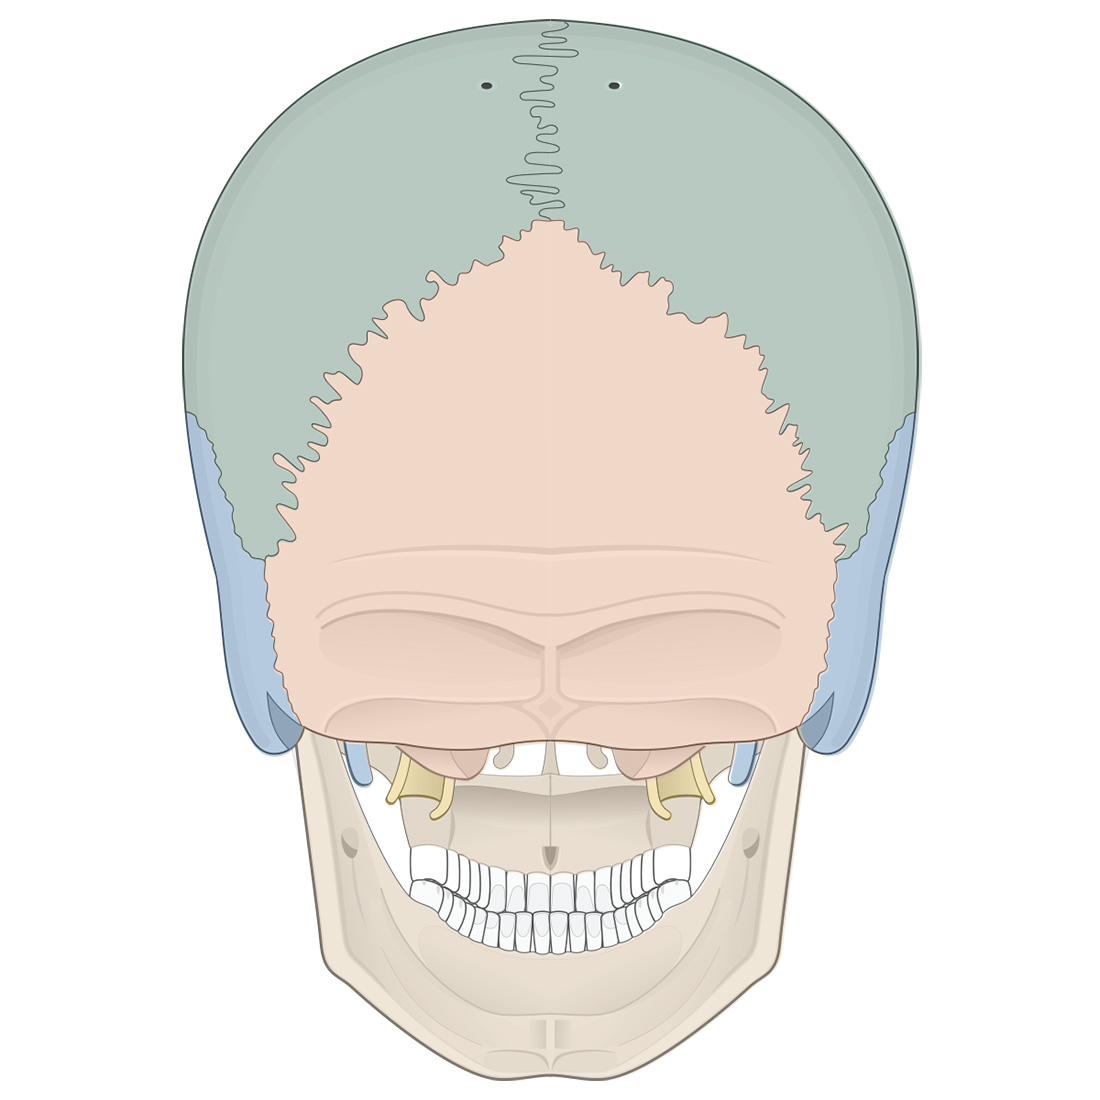 Cranial bones: posterior view of the skull